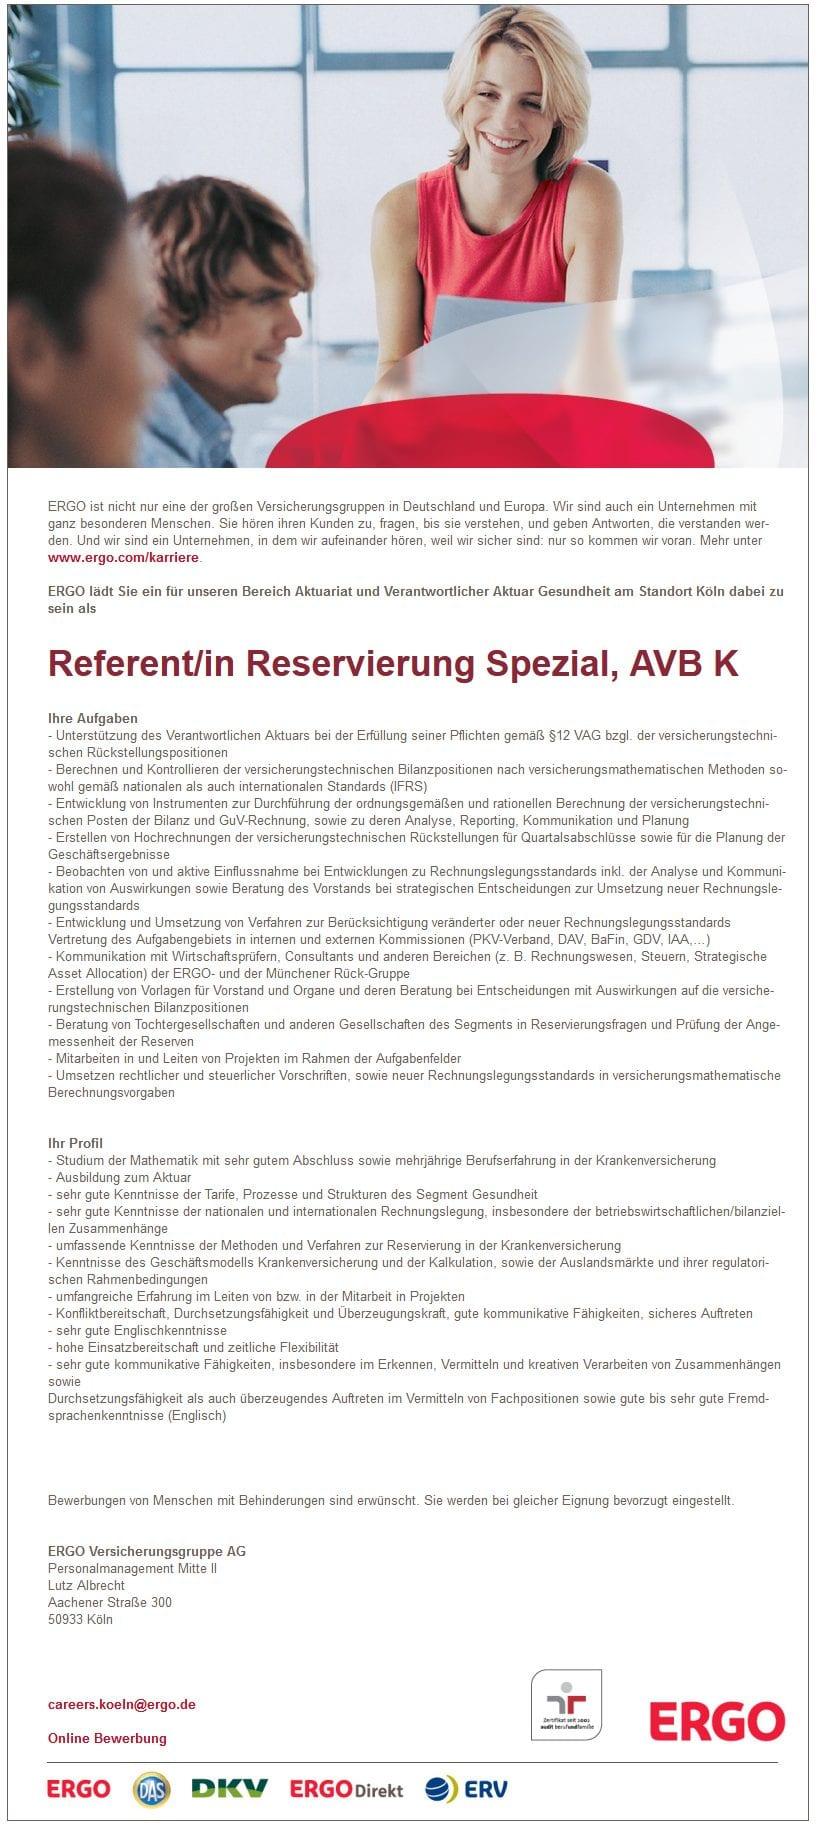 Referent Reservierung Spezial AVB K - nee, is klar